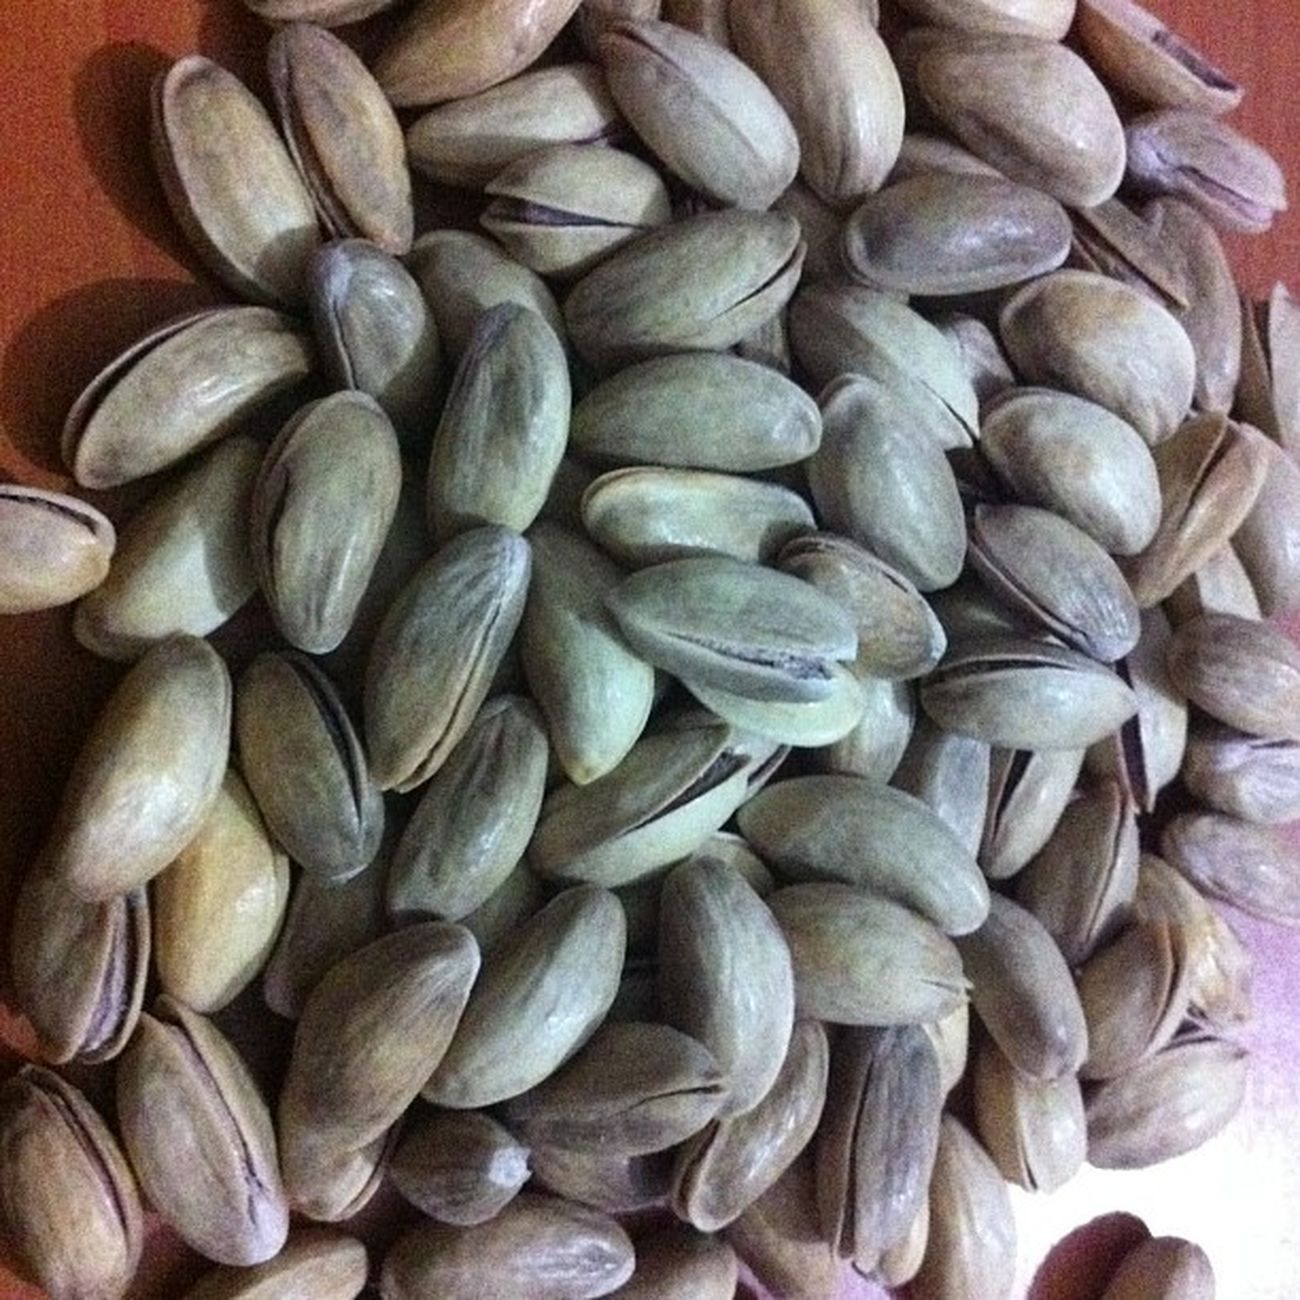 Cildi guzellestirir Enerji verir ayriyeten aganigi naganigiiii Fistik Yemek Food peanut energy